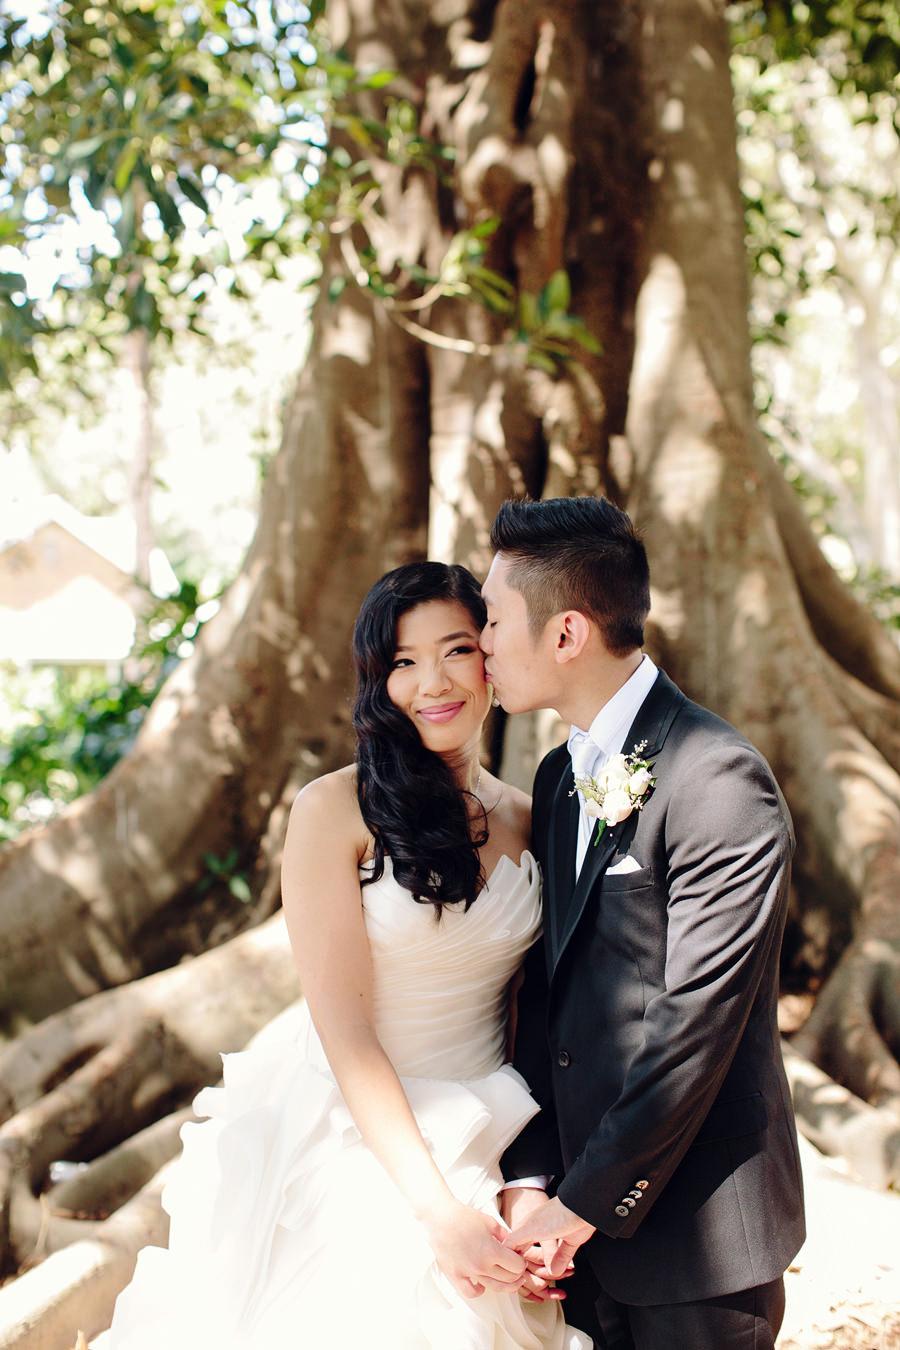 Balmain Wedding Photographer: Bride & Groom portraits